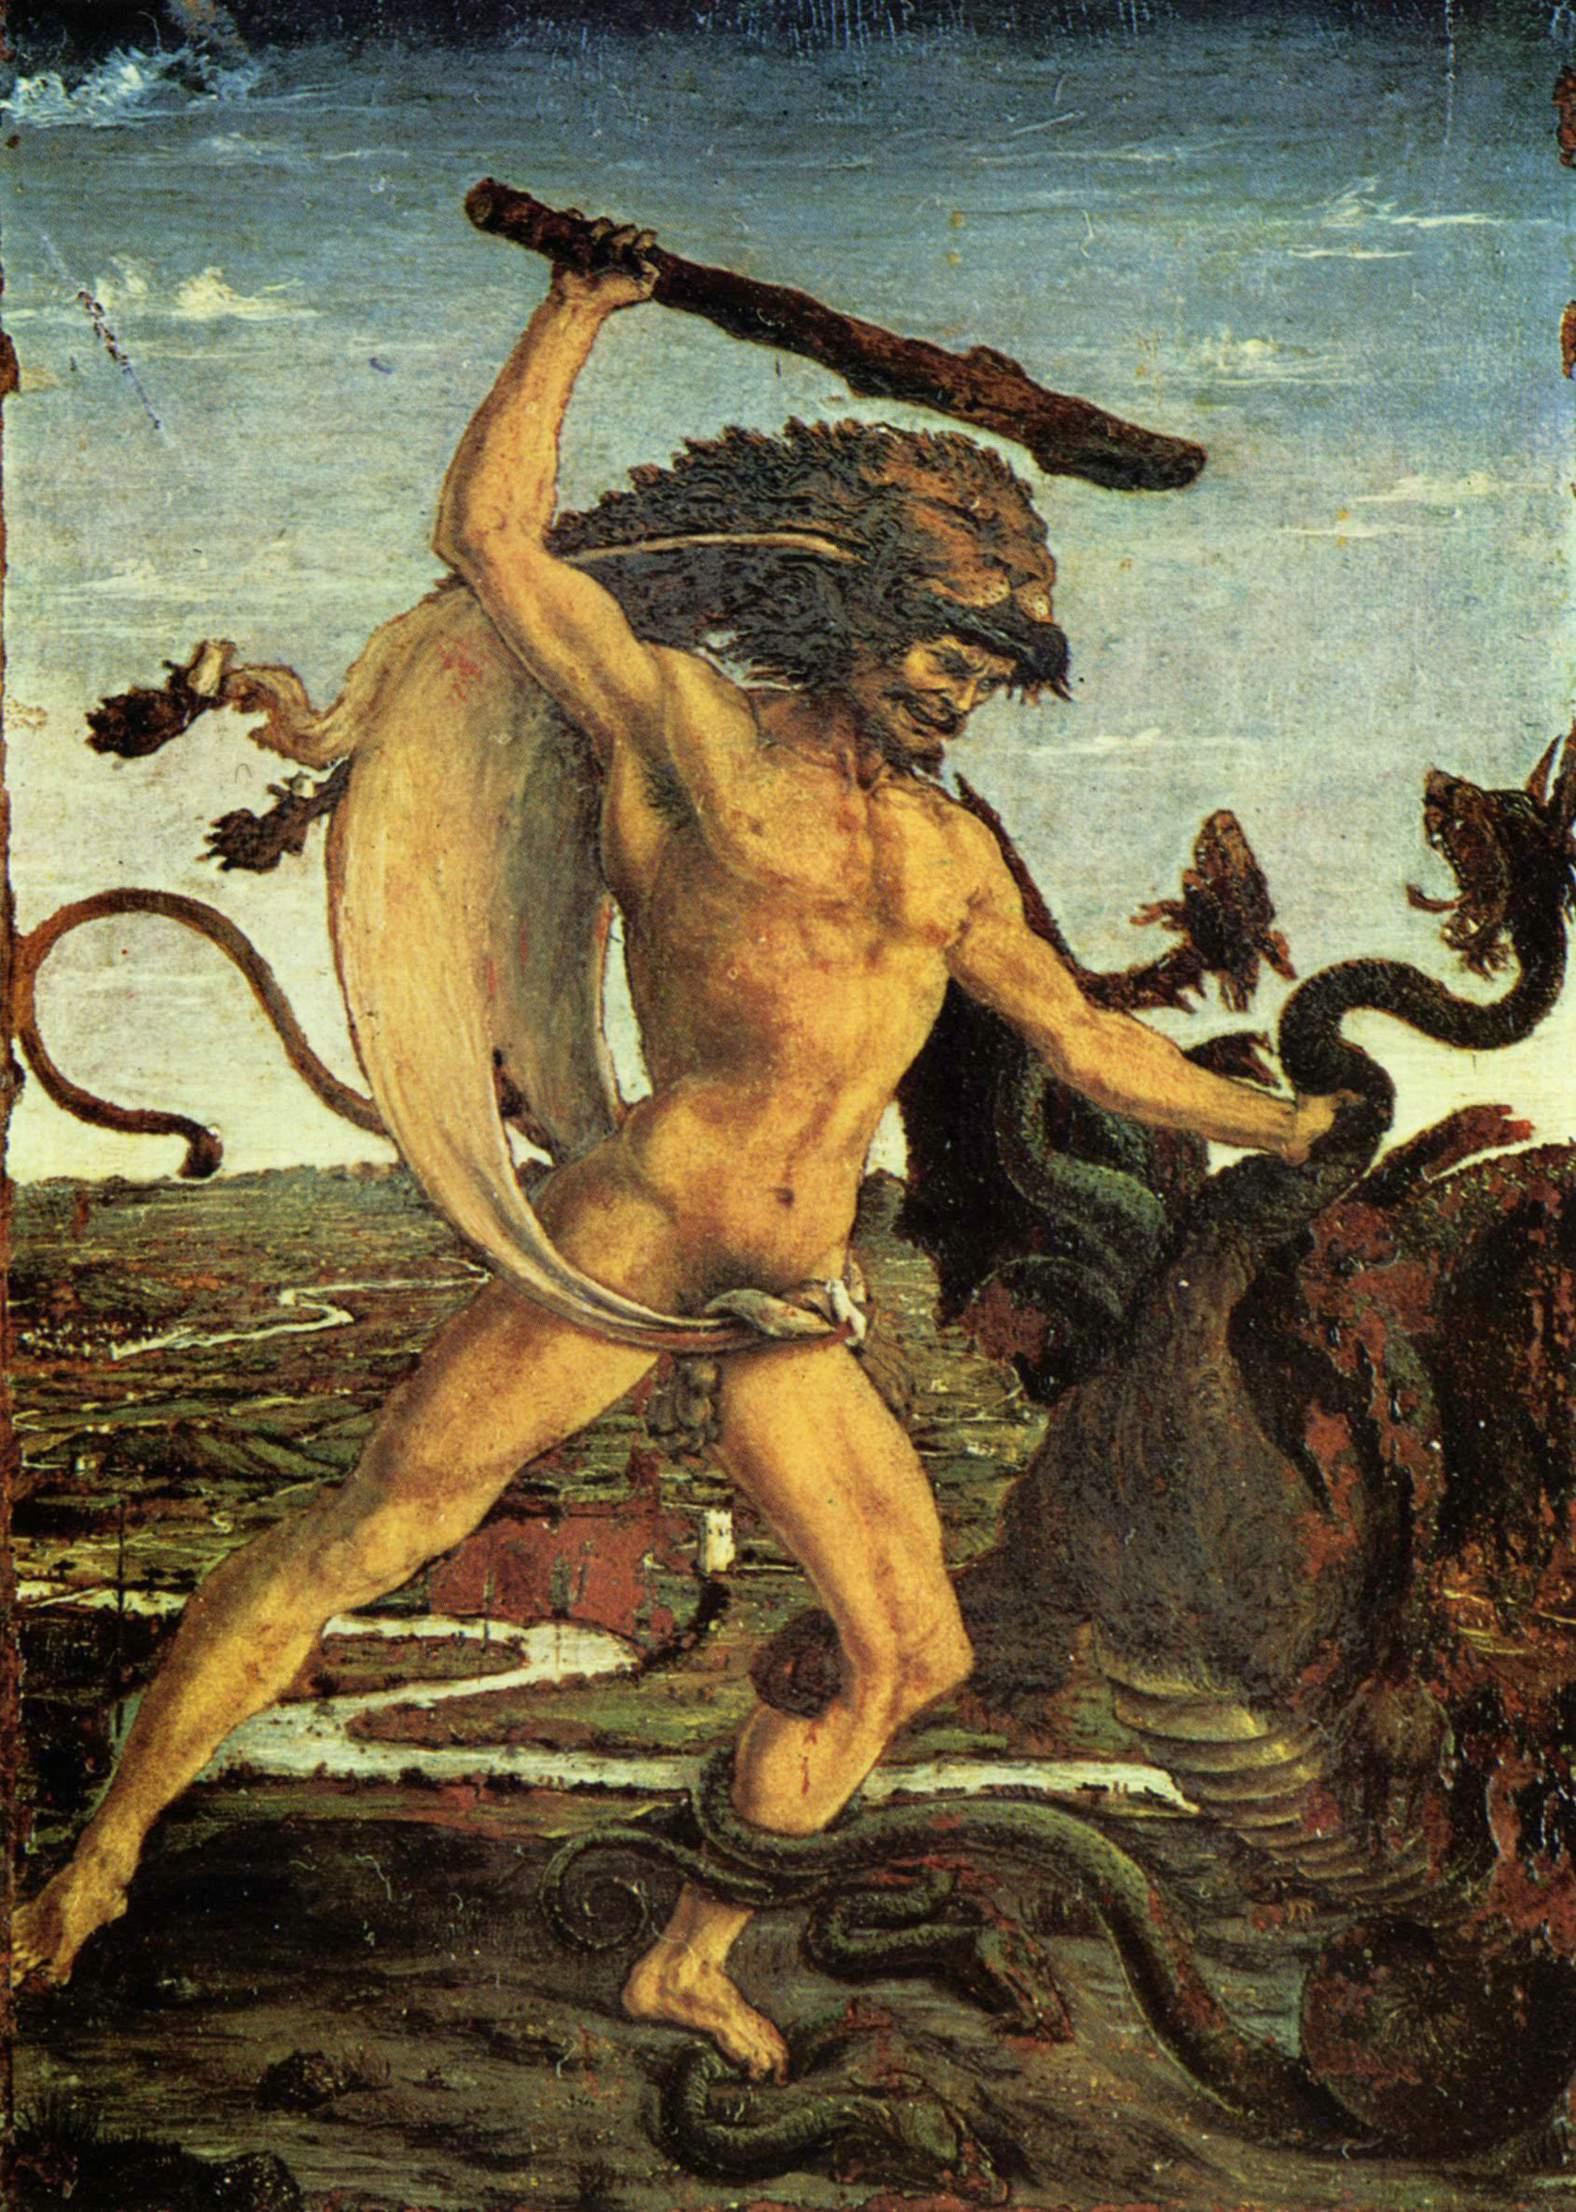 Pollaiuolo: Herkules und Hydra